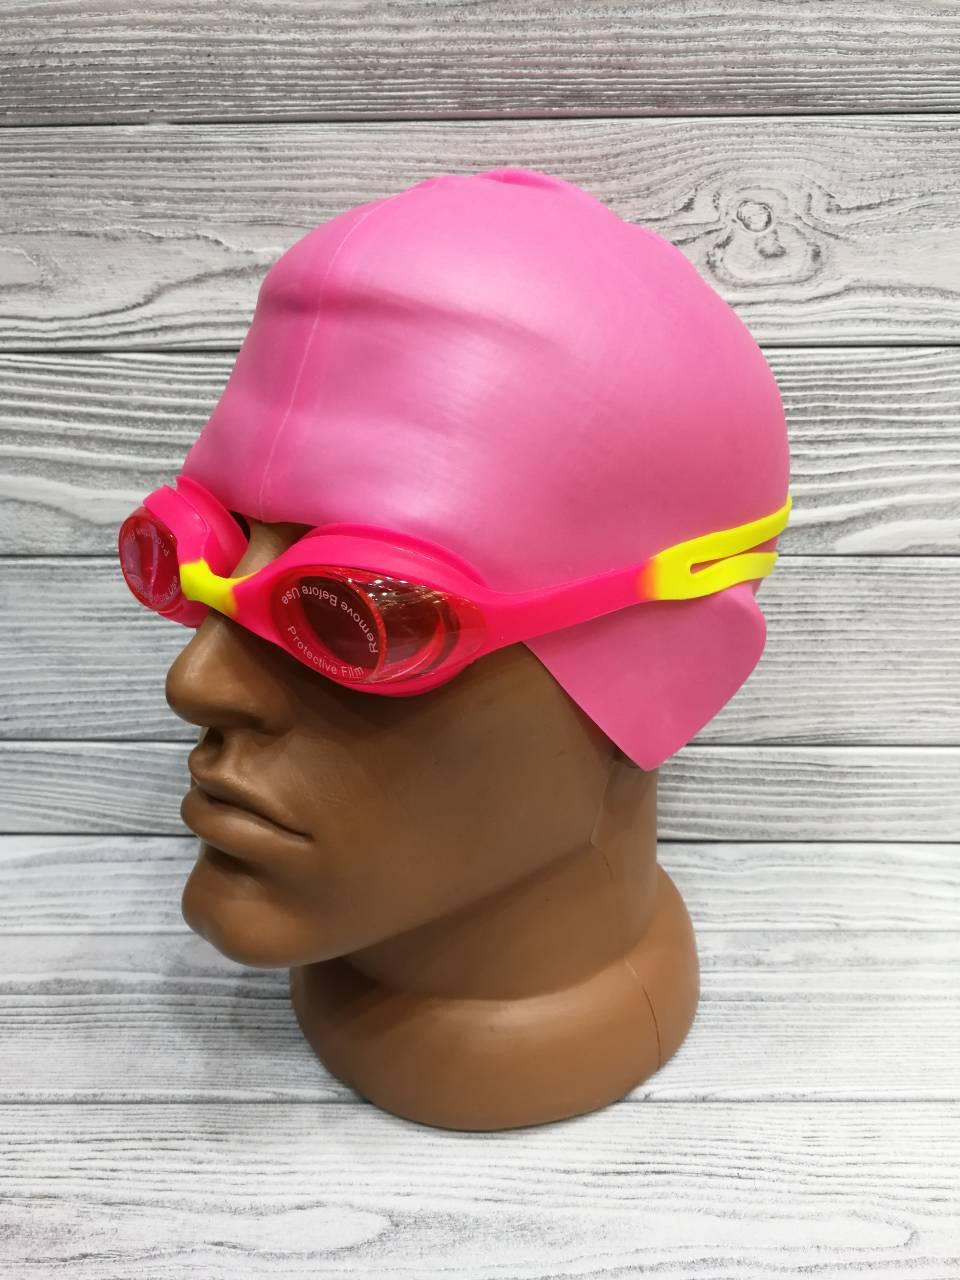 Набор для плавания детский Grilonq Pink